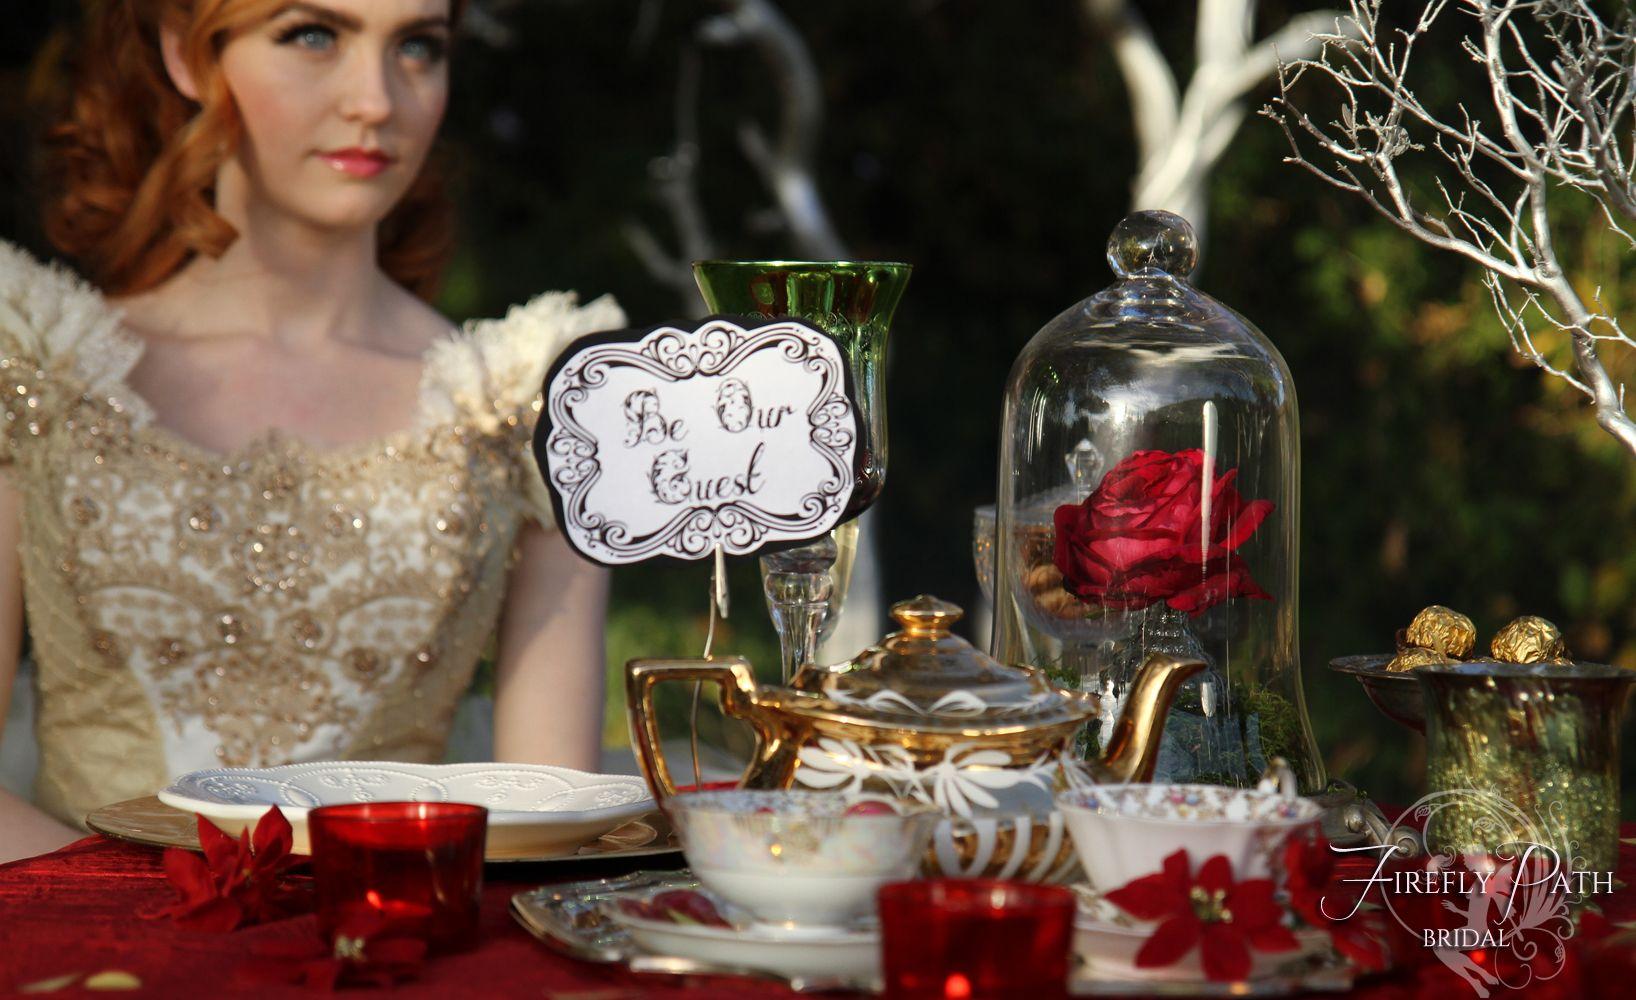 Beauty and the Beast Themed Wedding by Lillyxandradeviantartcom